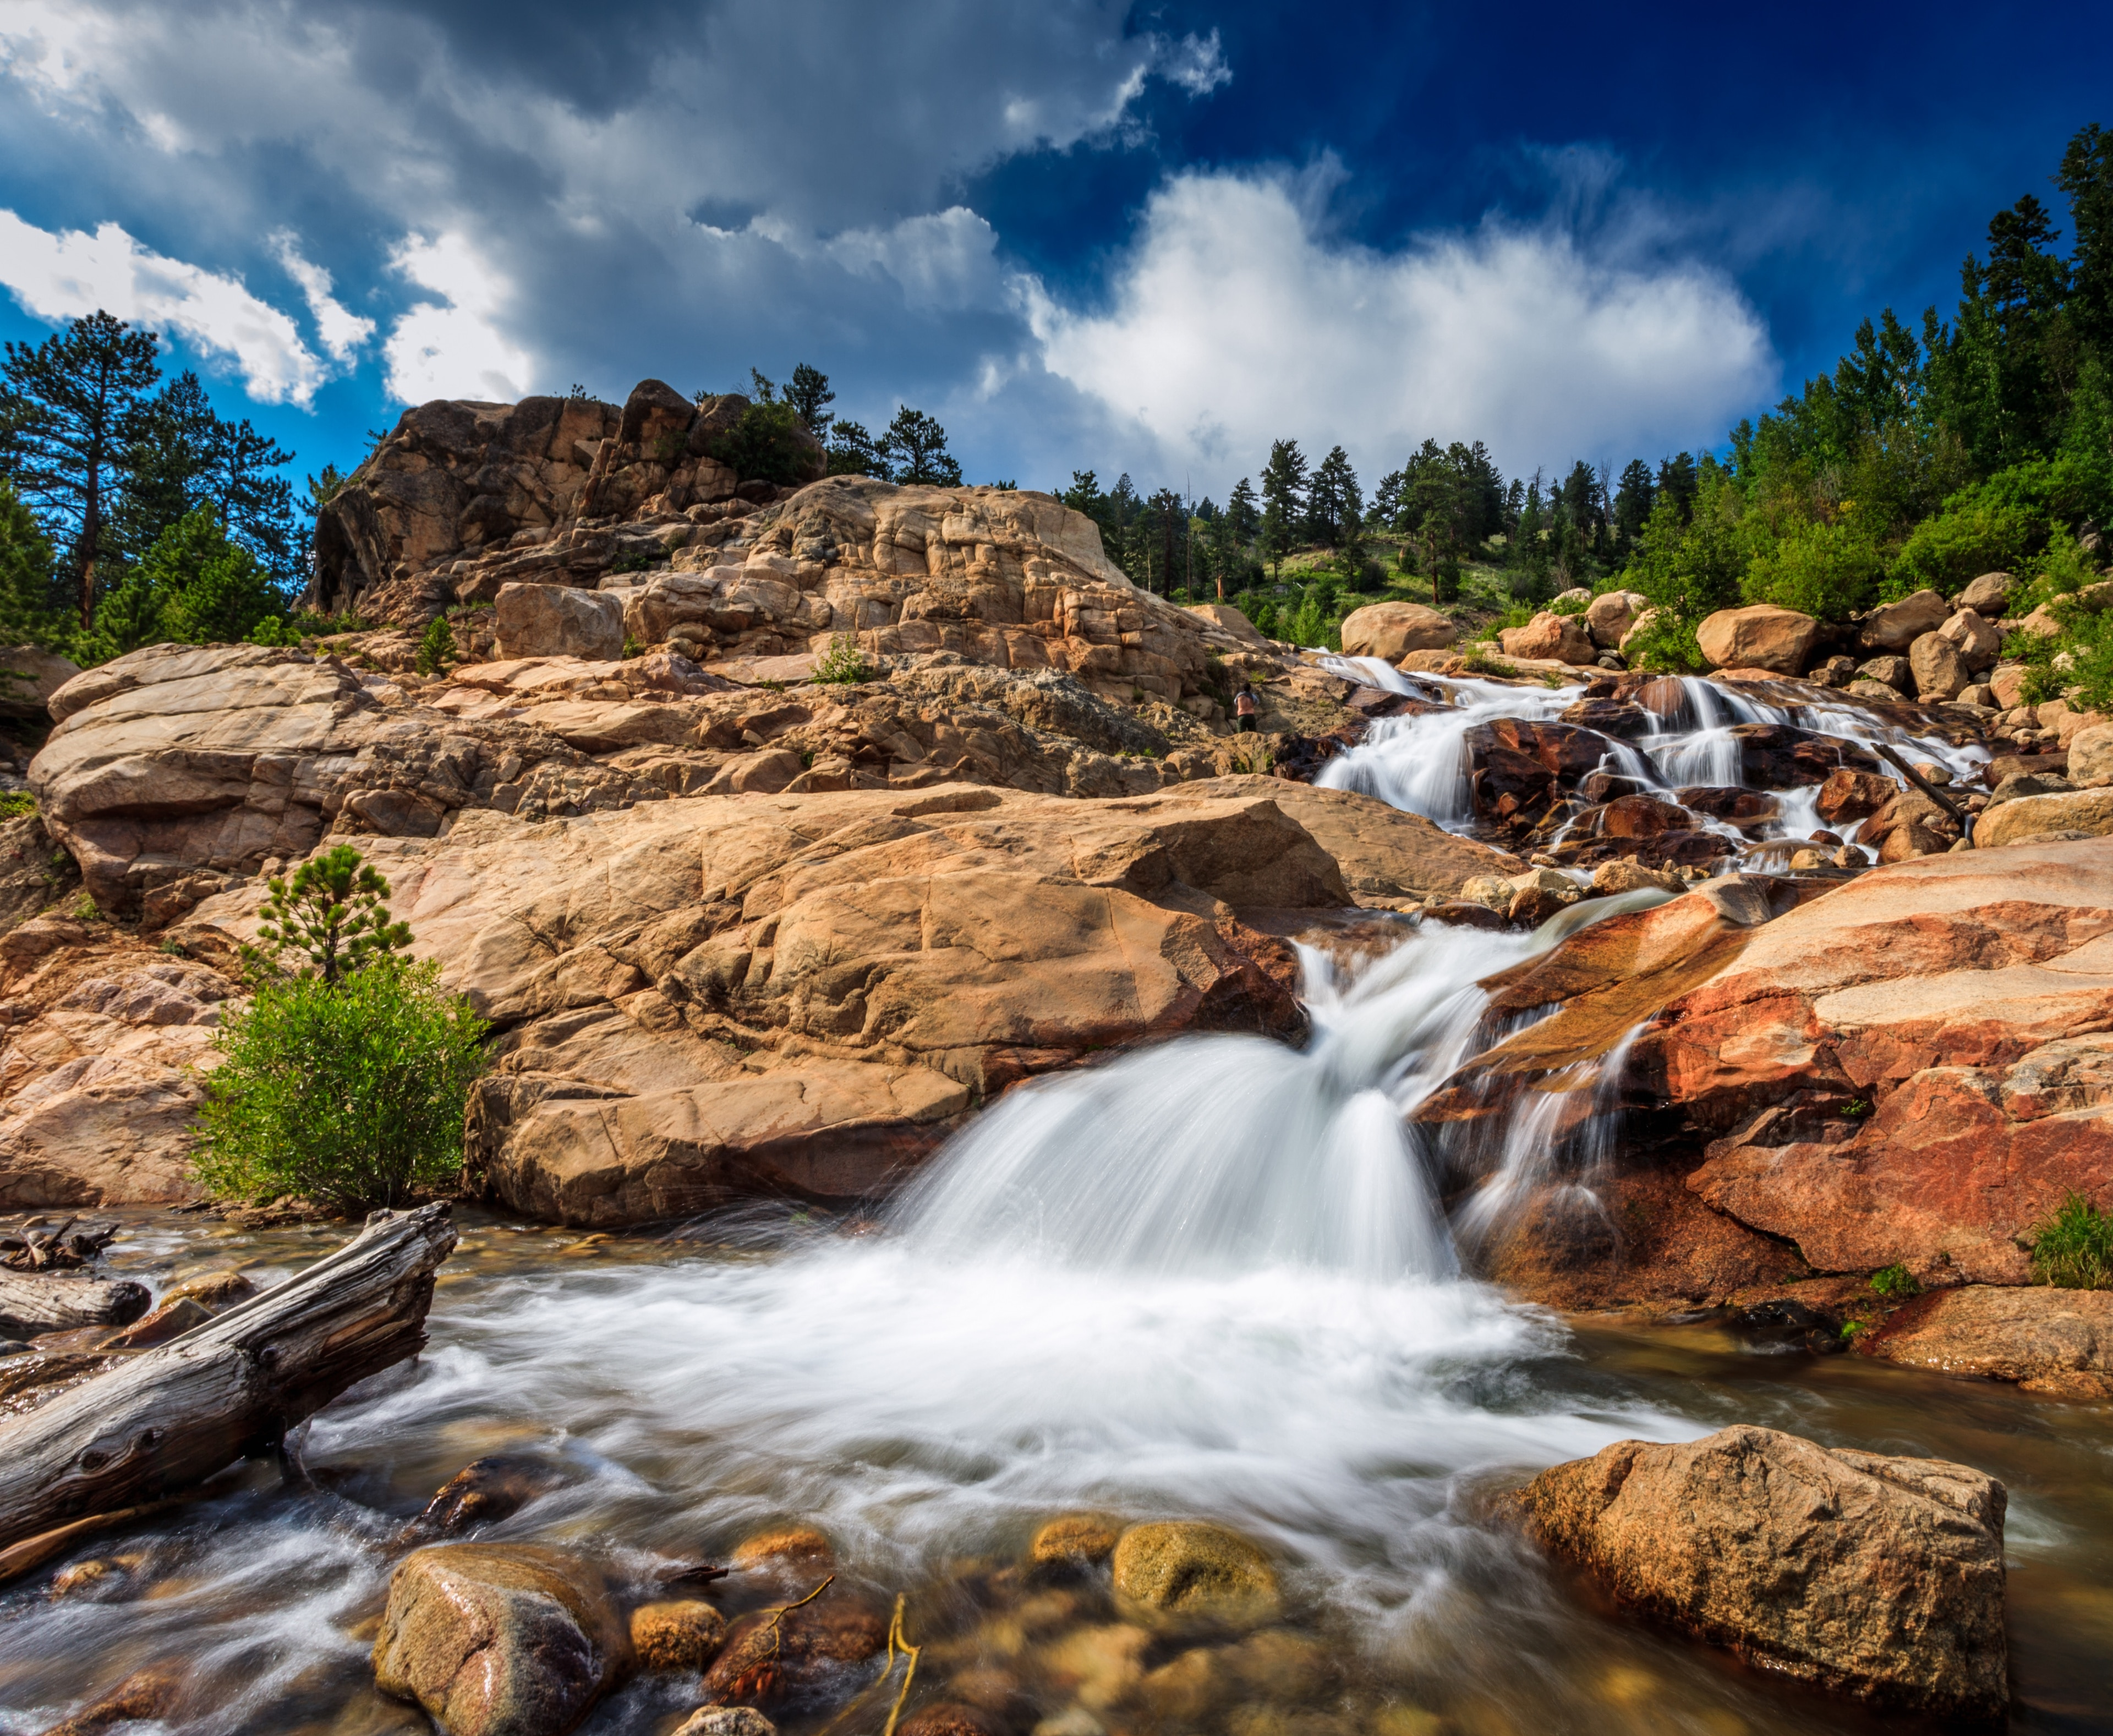 Sanders County, Montana, United States of America